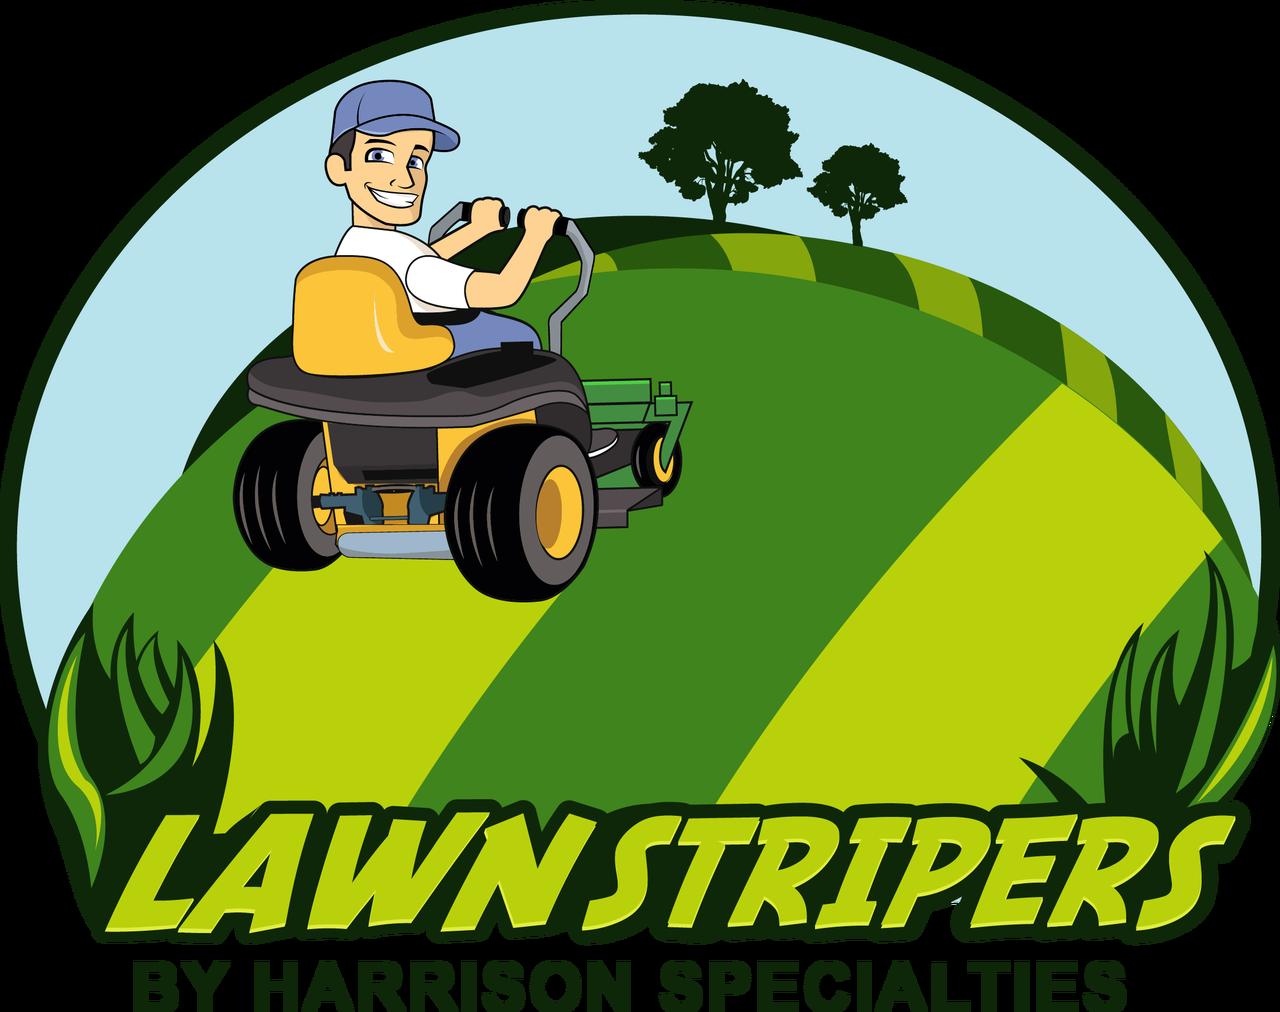 "eXmark Vantage with 48"" or 52"" Deck Lawn Striper"